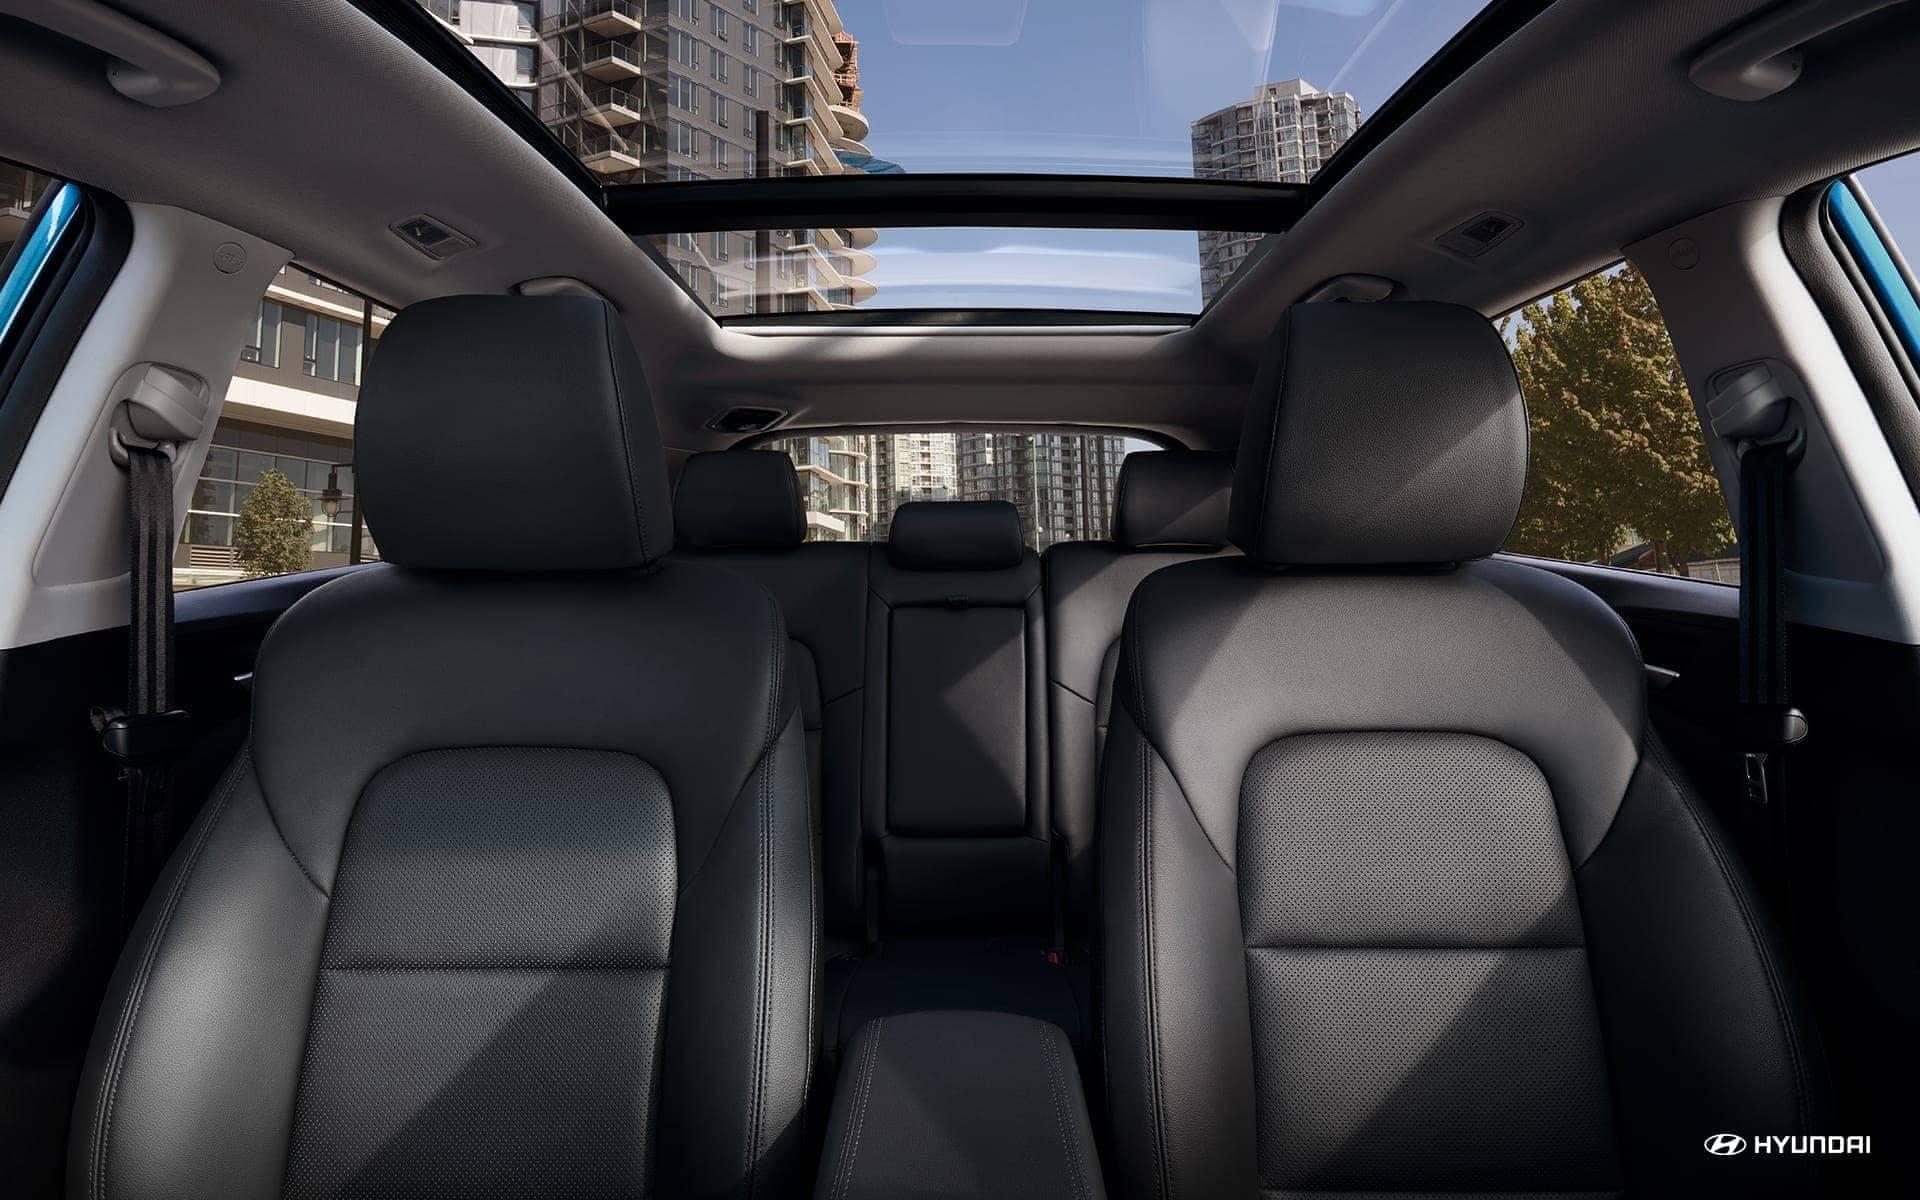 2019-Hyundai-Tucson-leather-seating-surfaces